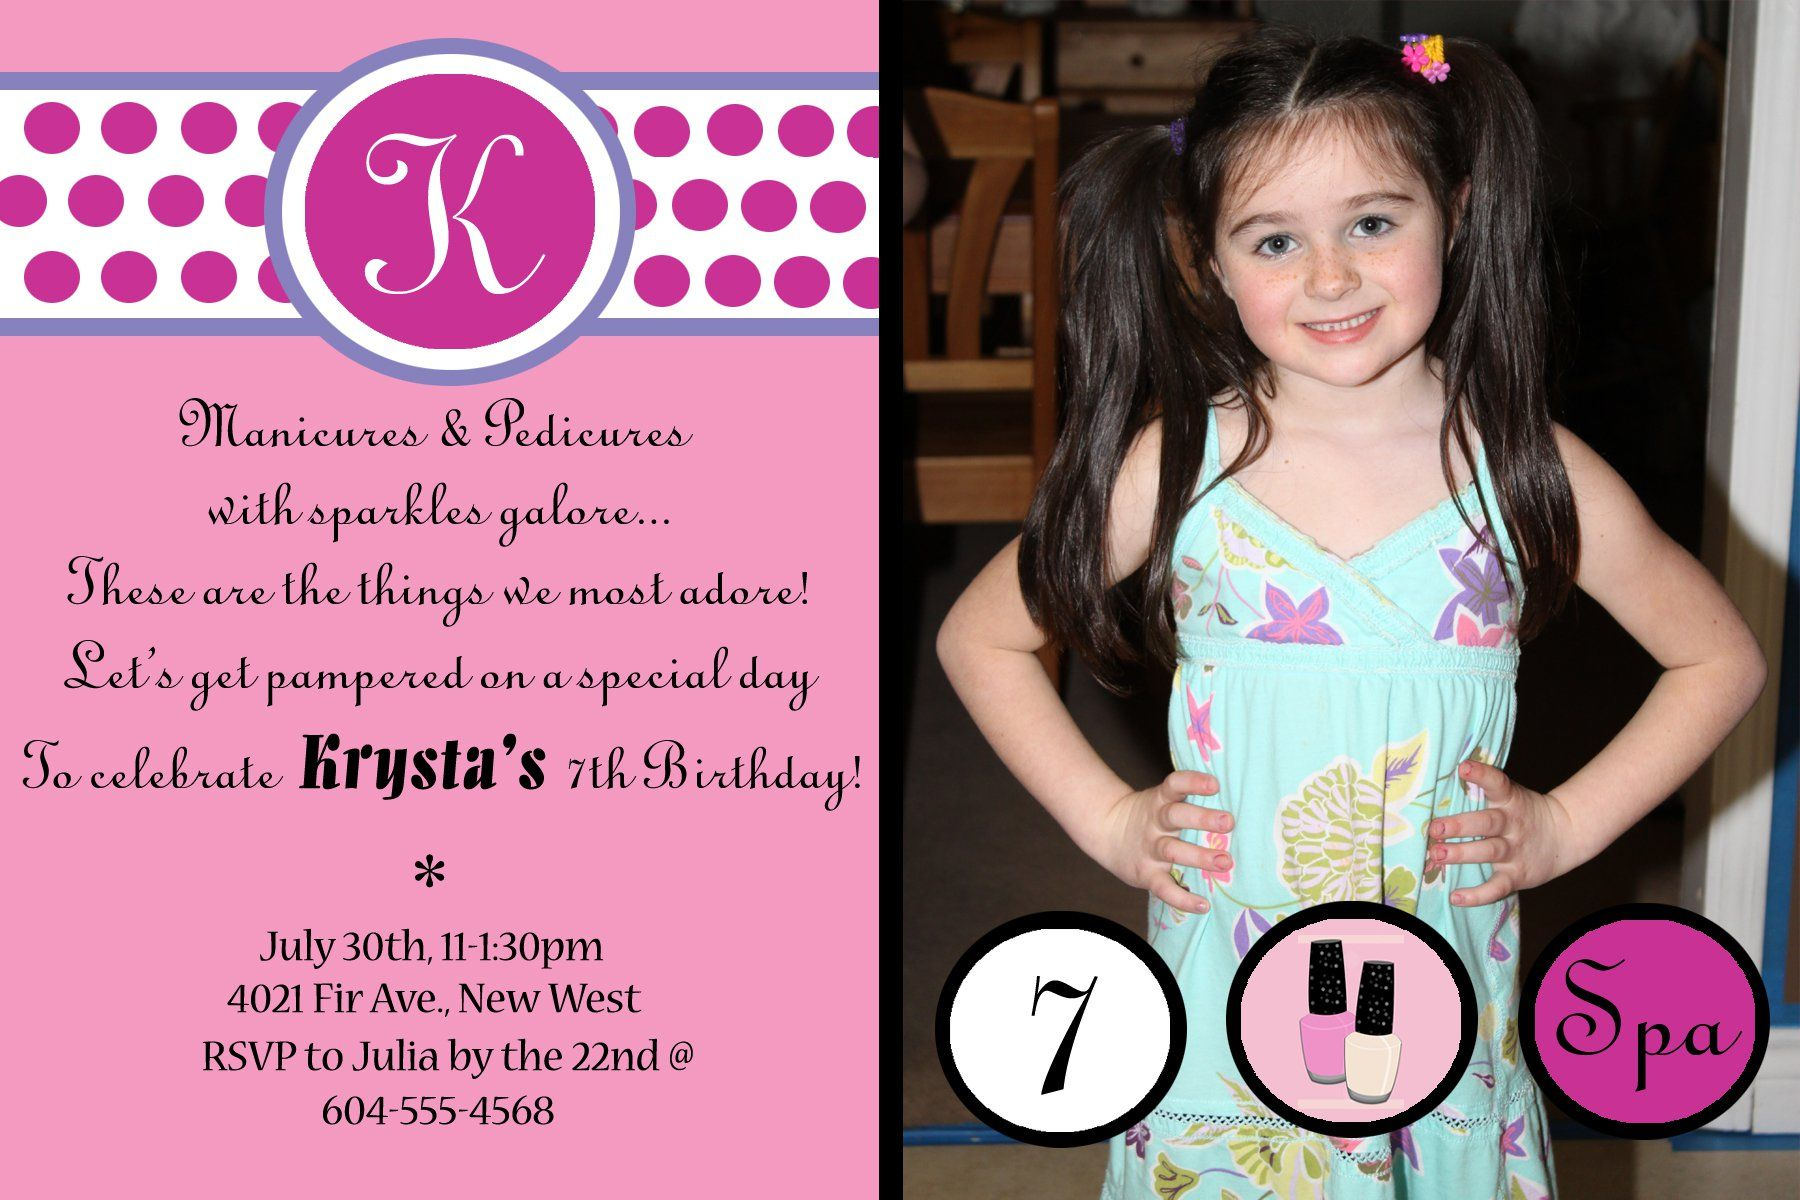 Birthday invitation card design online birthday invitations birthday invitation card design online stopboris Image collections